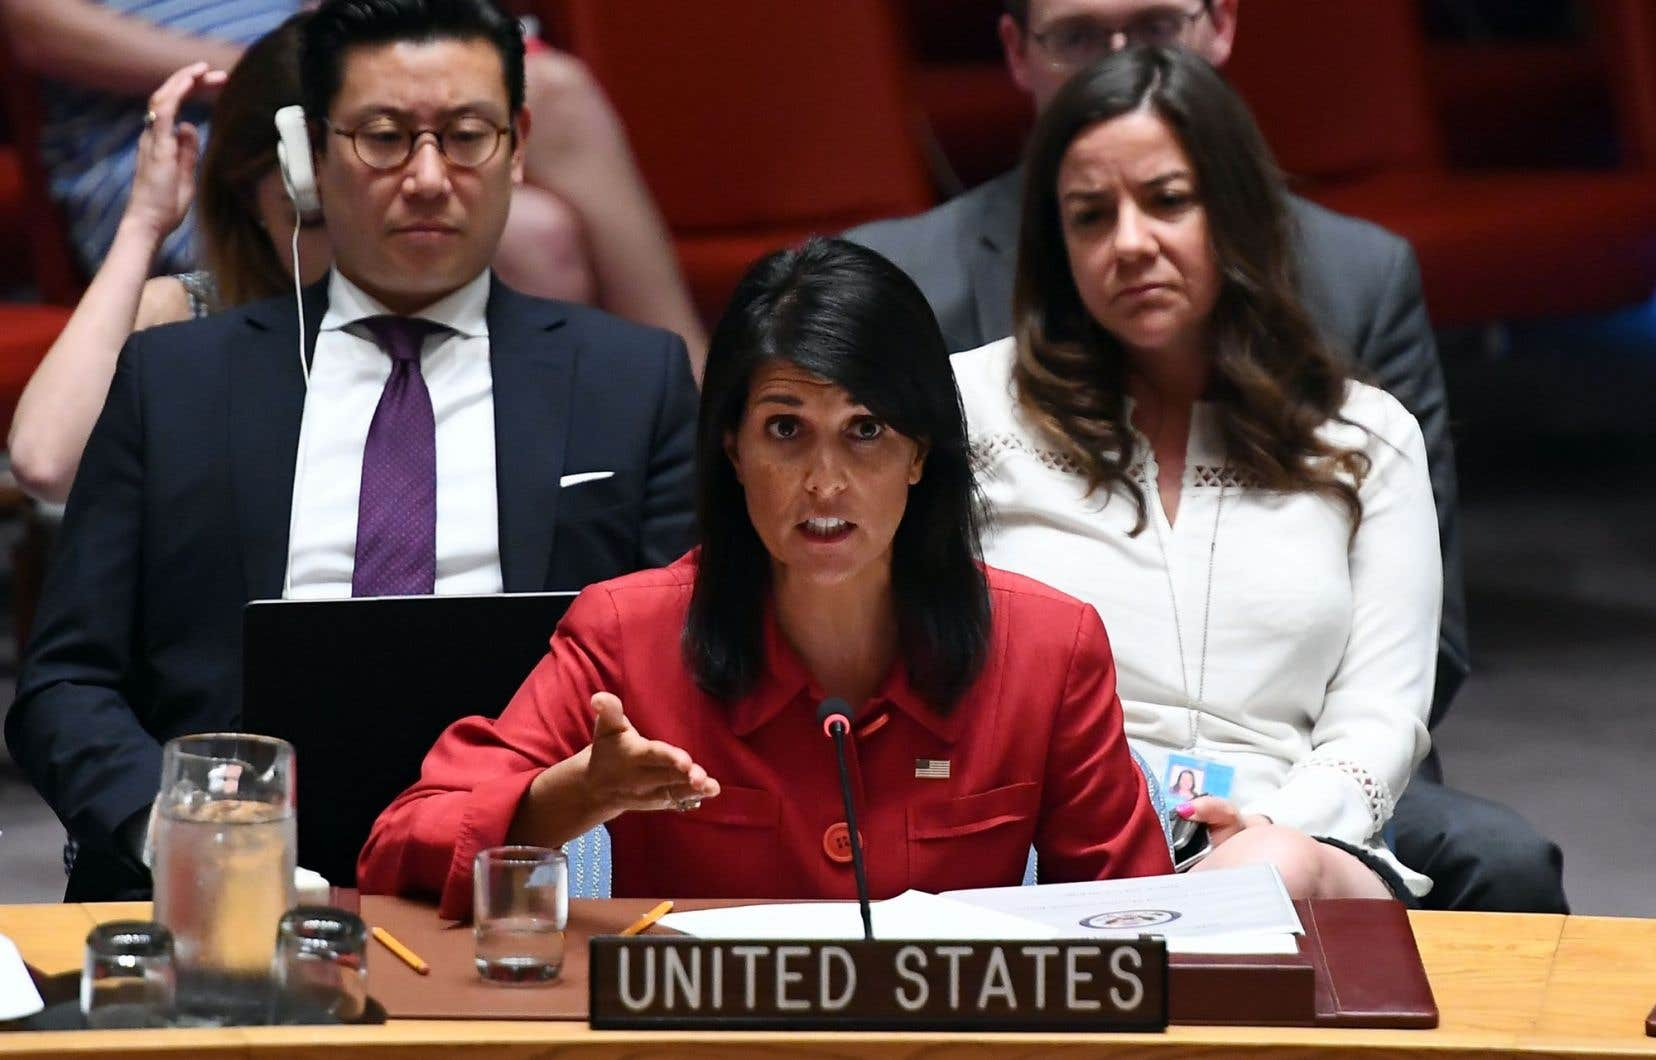 L'ambassadrice américaine aux Nations unies, Nikki Haley